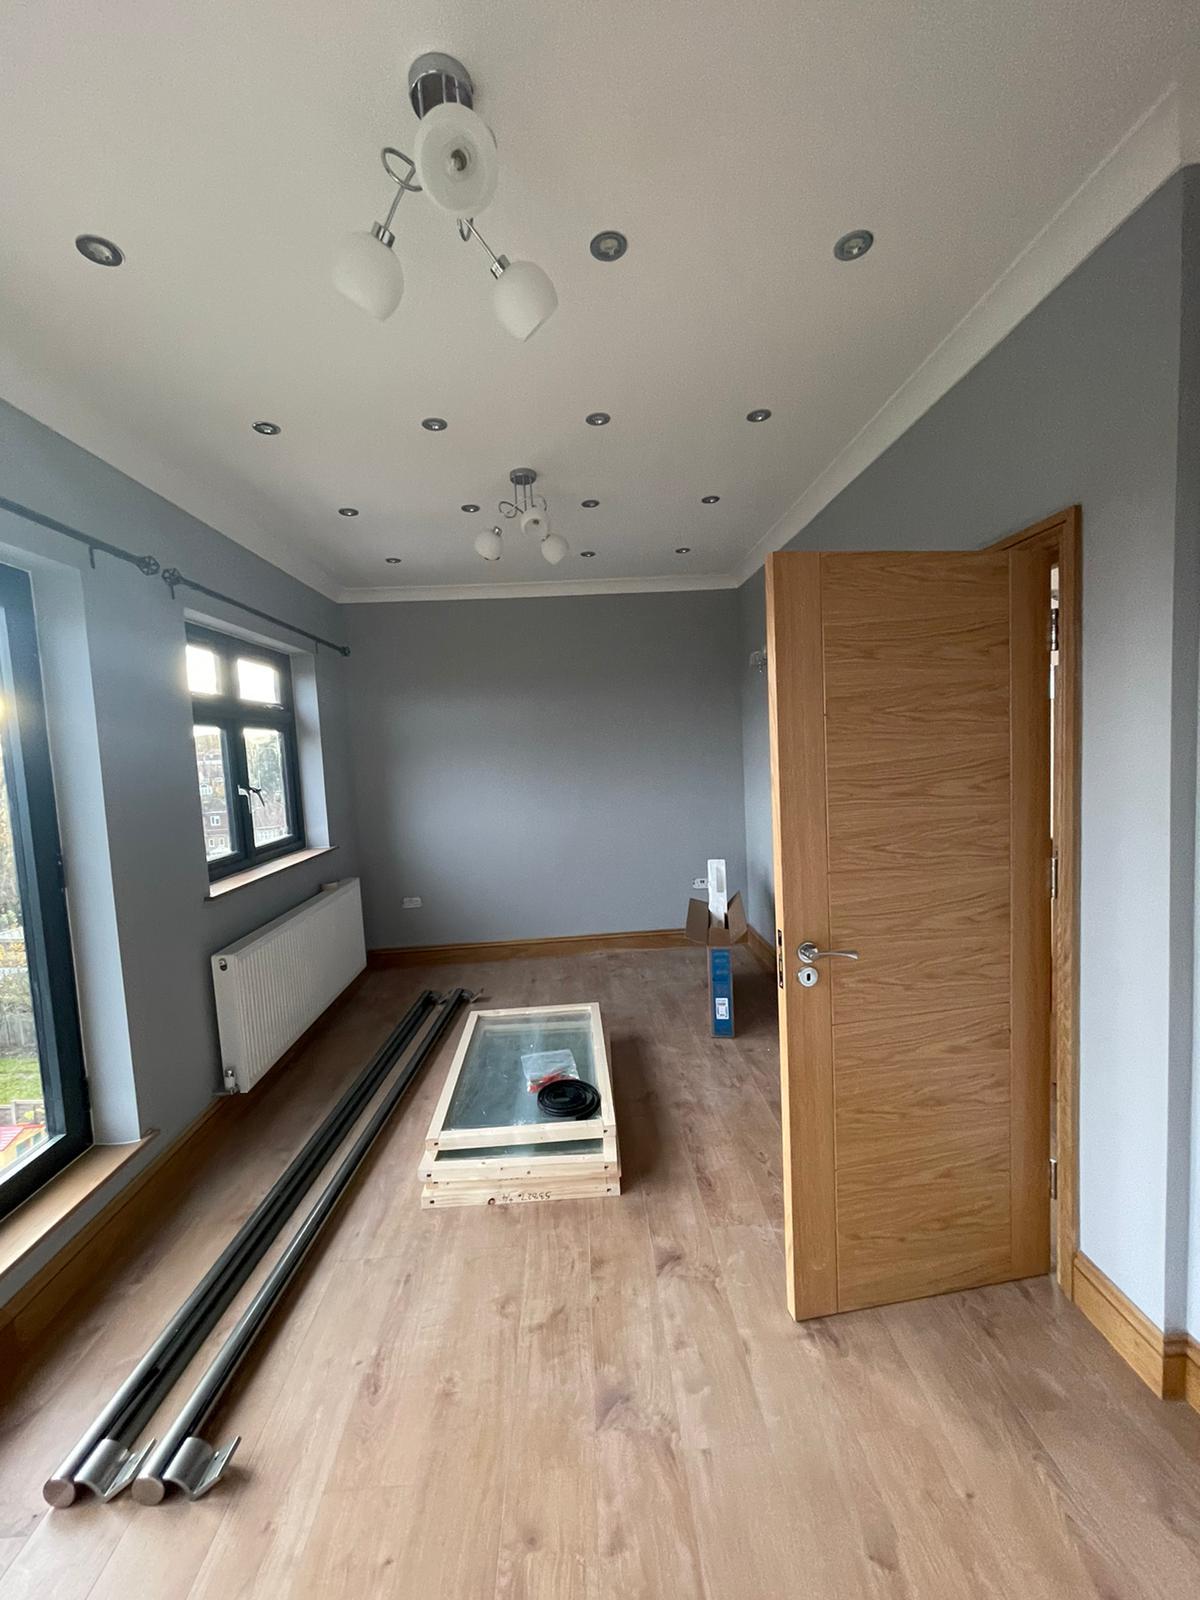 Finished Basement Ceilings